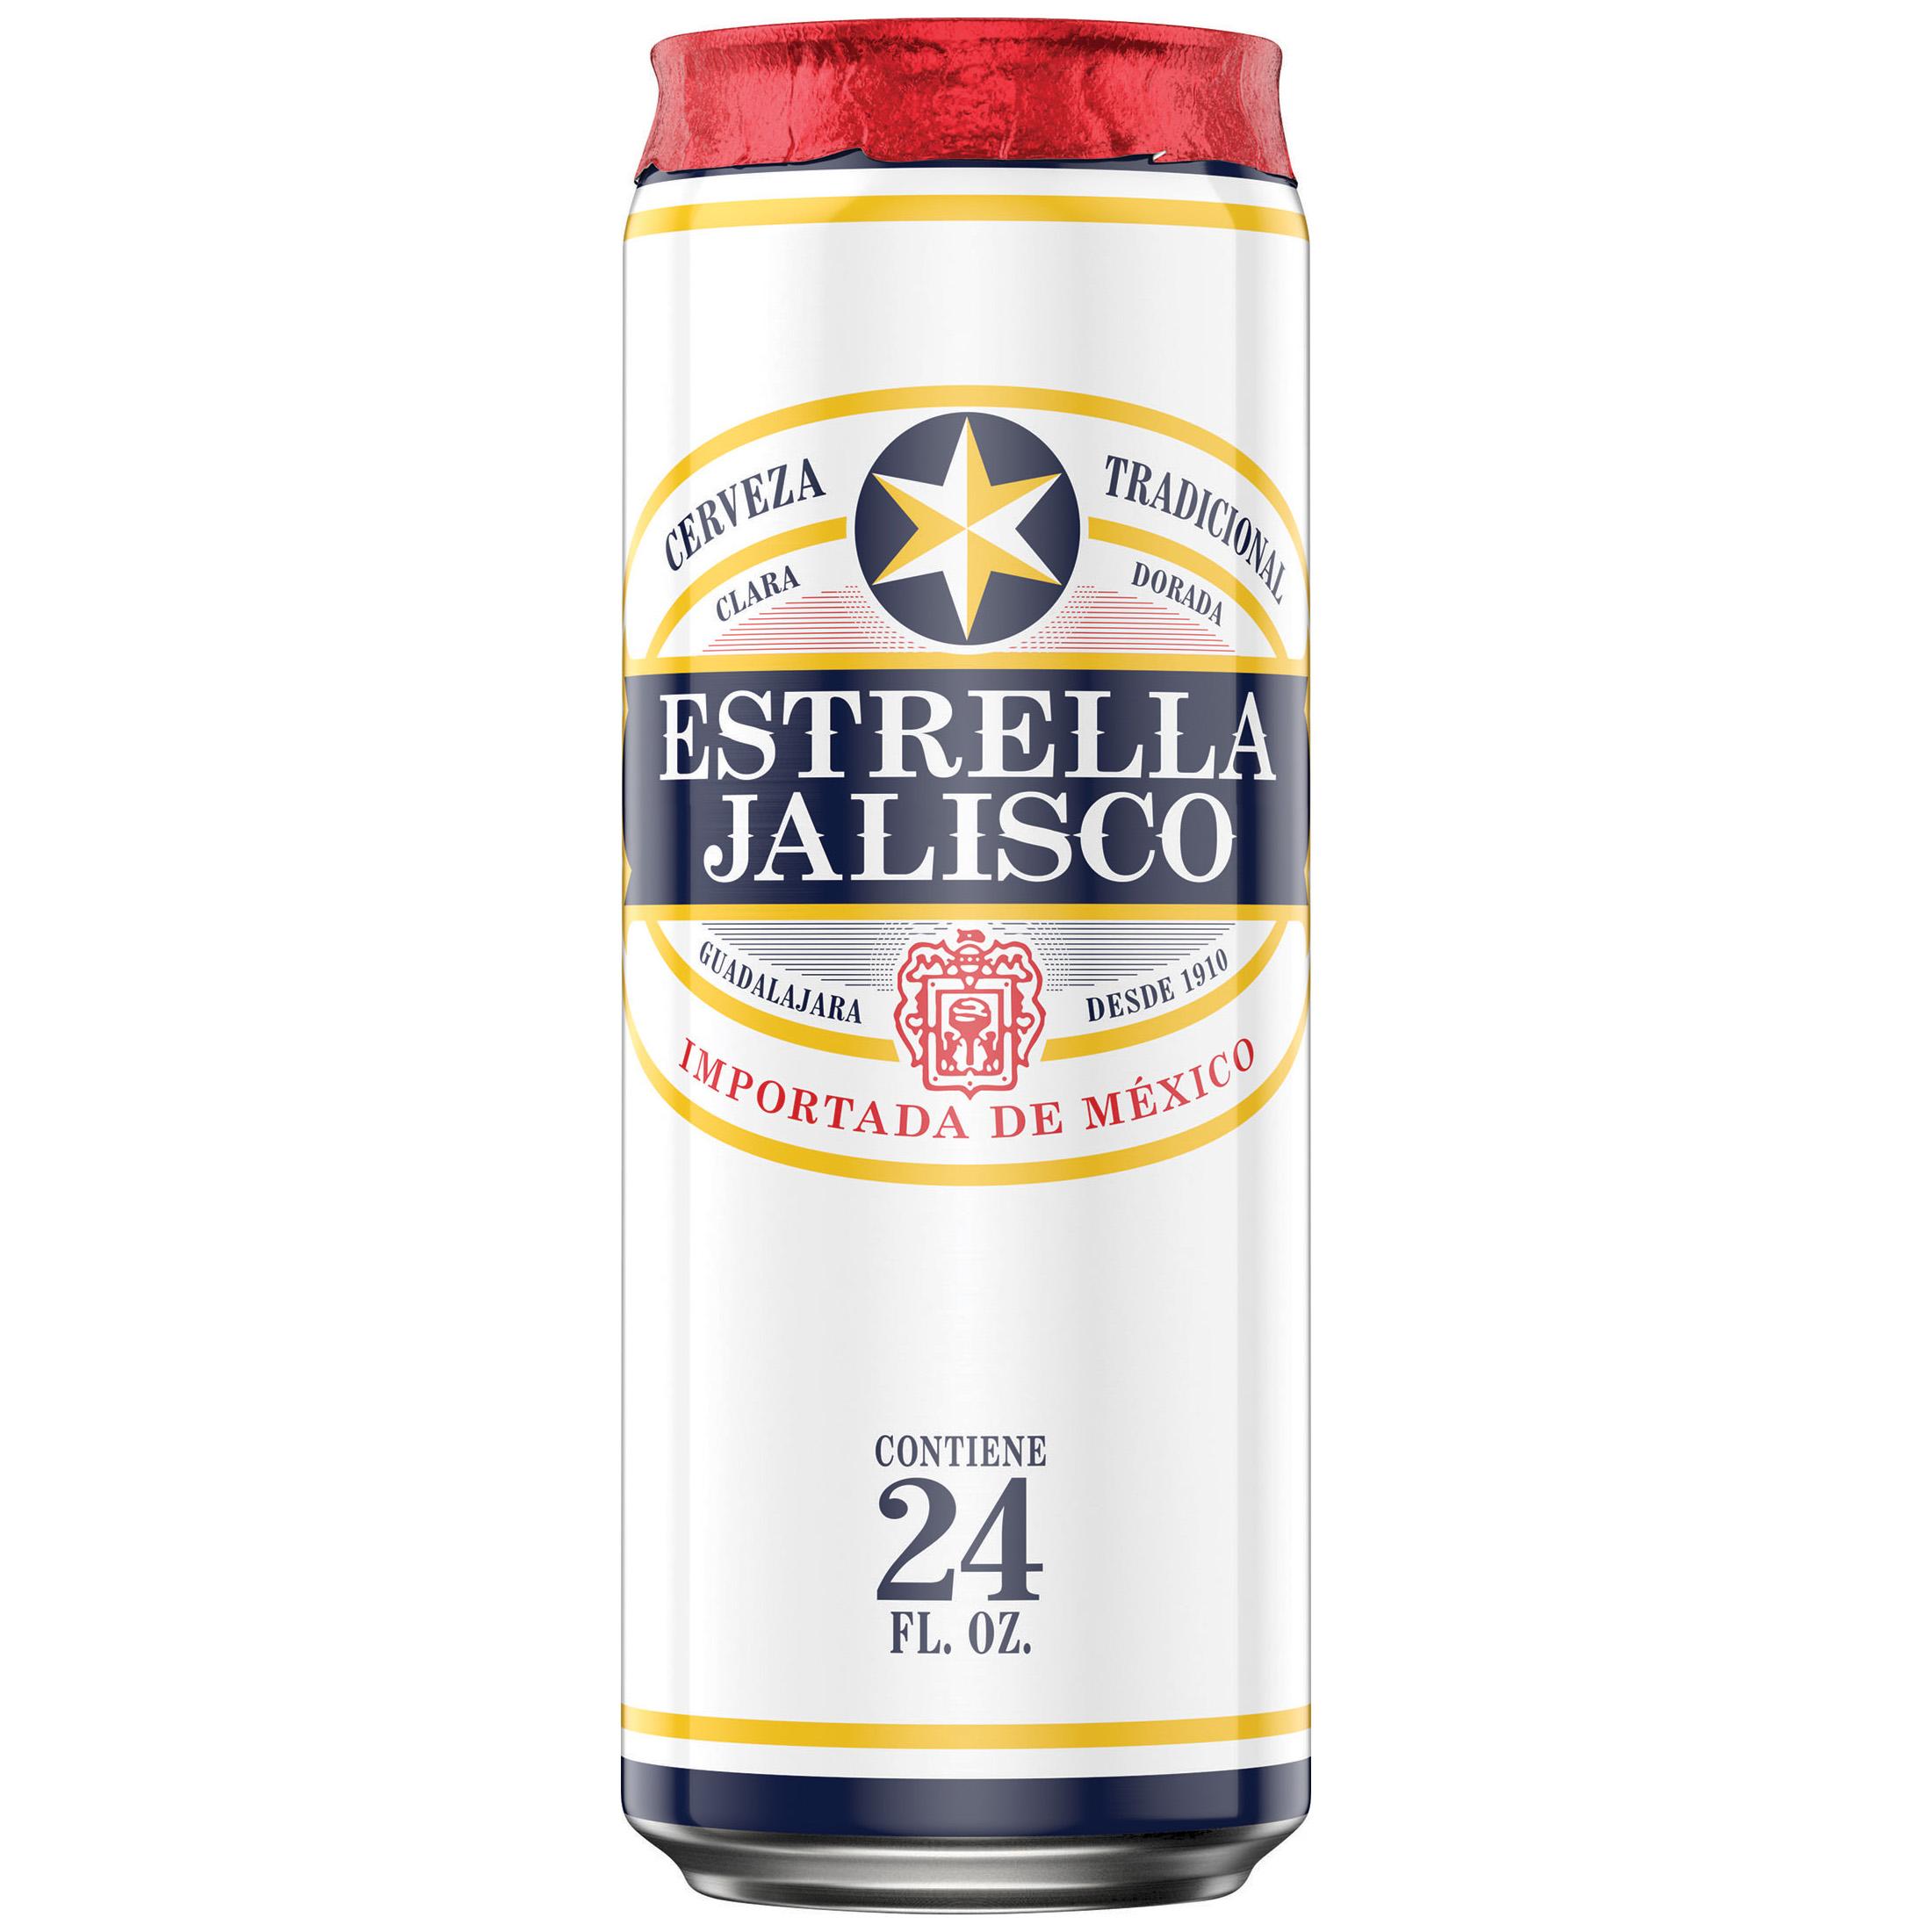 Estrella Jalisco